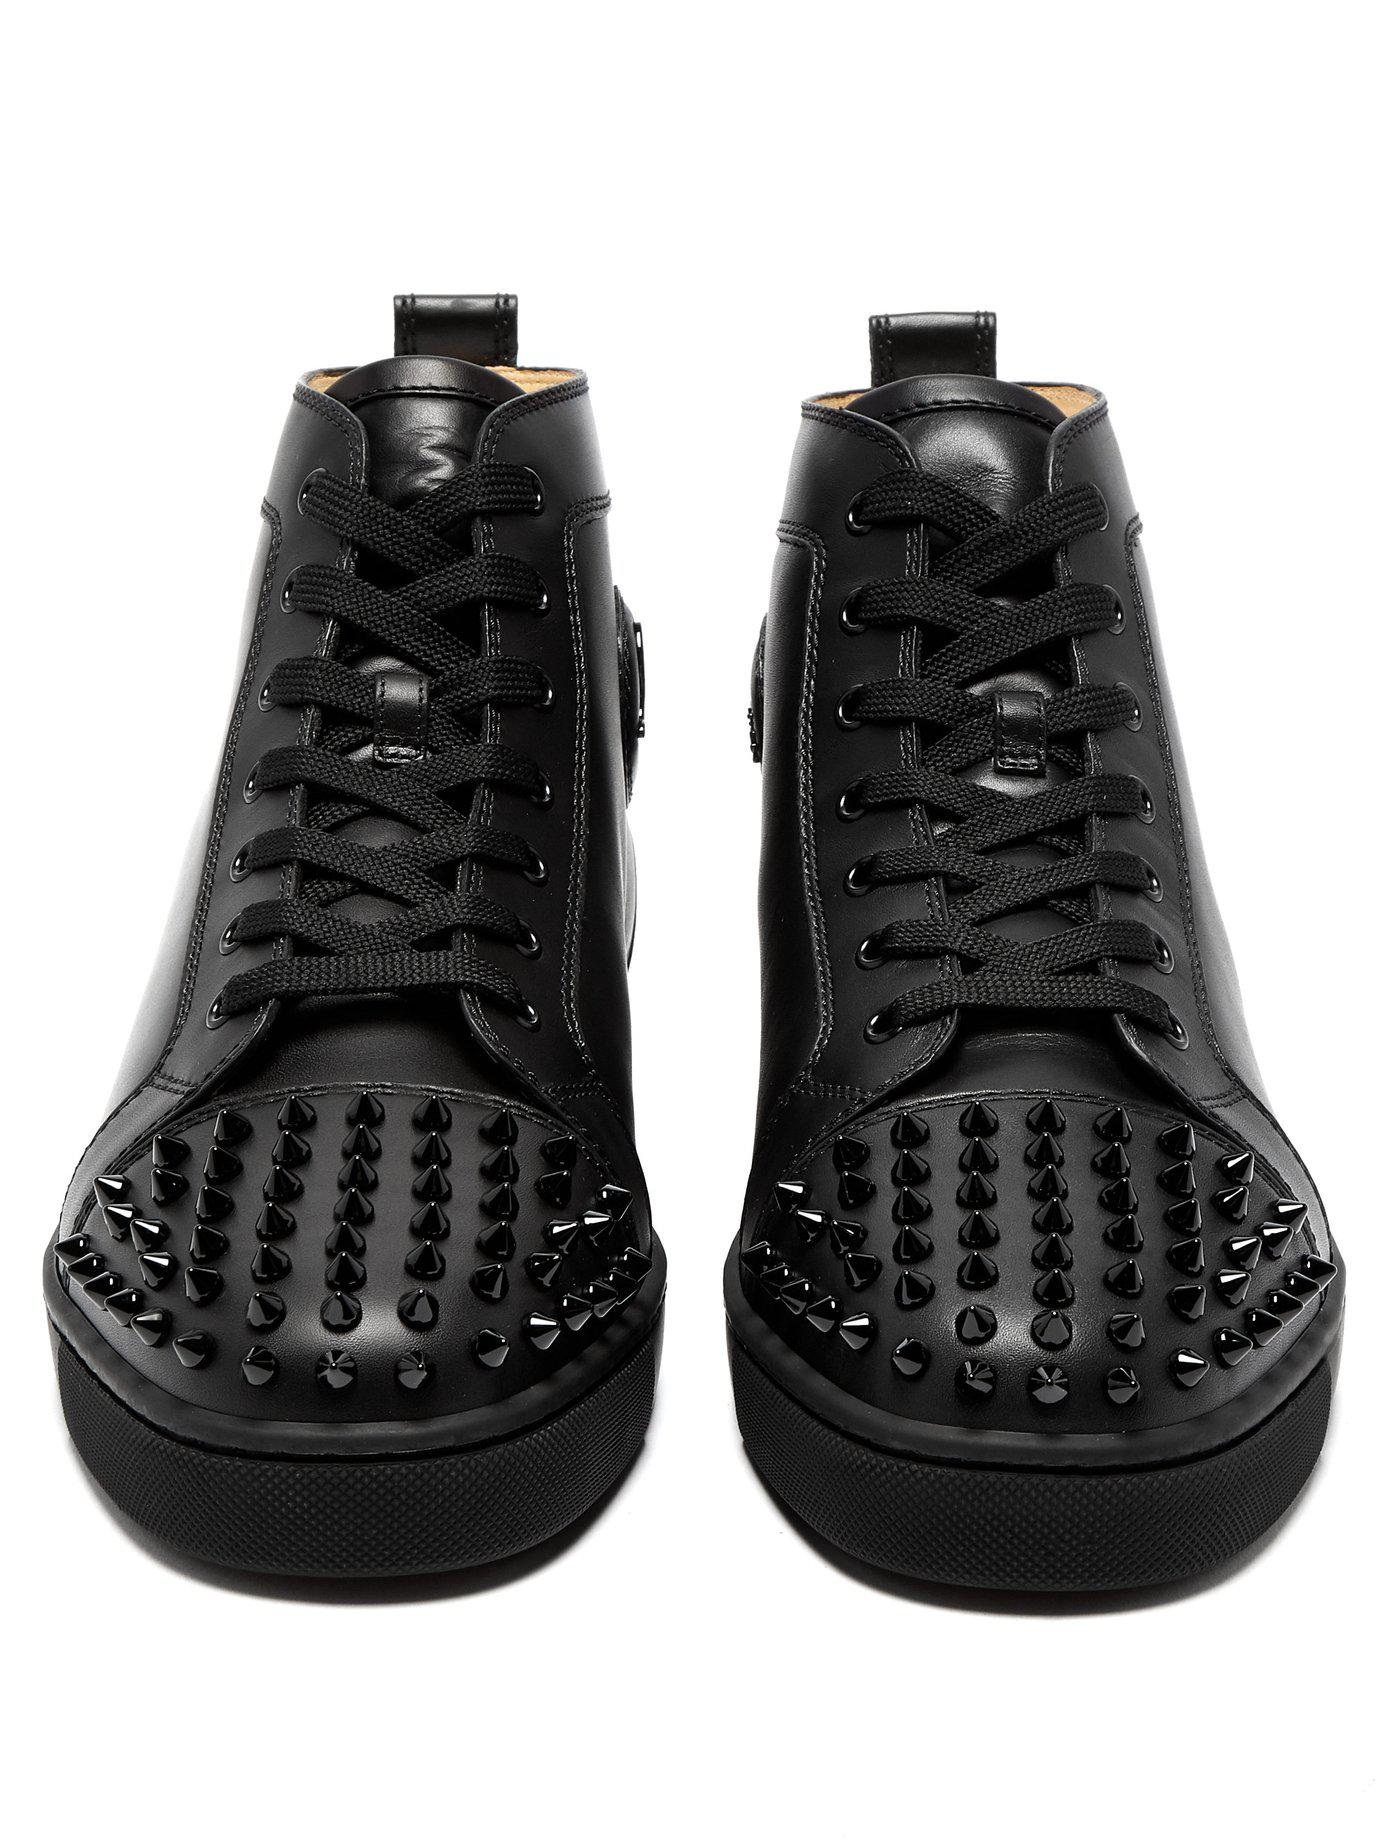 adb3aaaf8c47 Christian Louboutin - Black Lou Spike Embellished Leather High Top Trainers  for Men - Lyst. View fullscreen